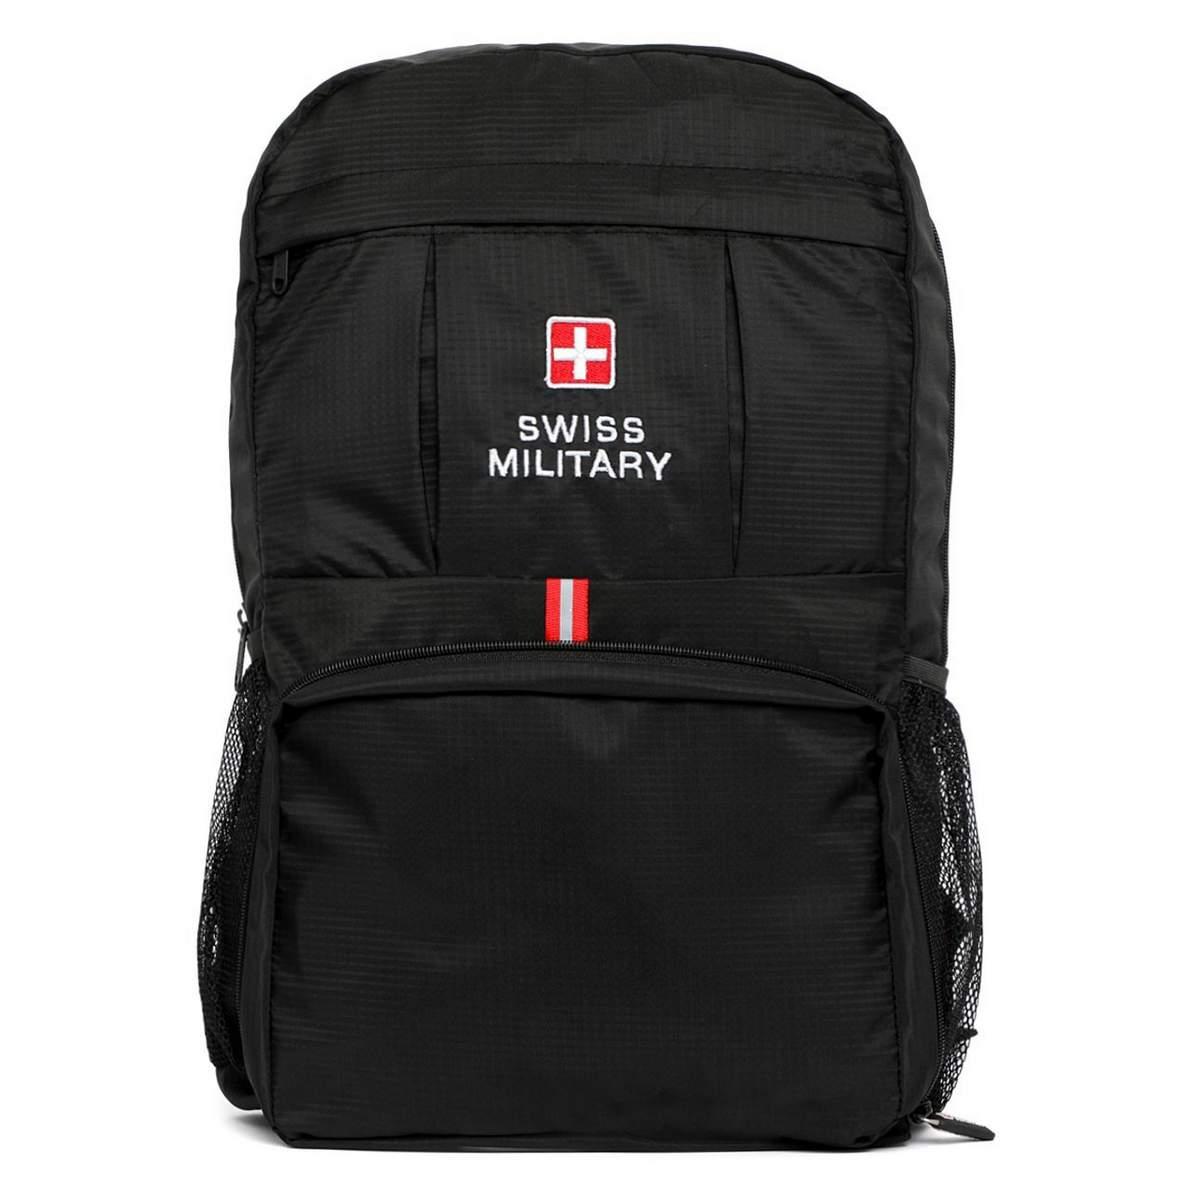 Swiss Military BP6 Premium Foldable Backpack Bag - Sunrise Trading ... ef4b96239beb0